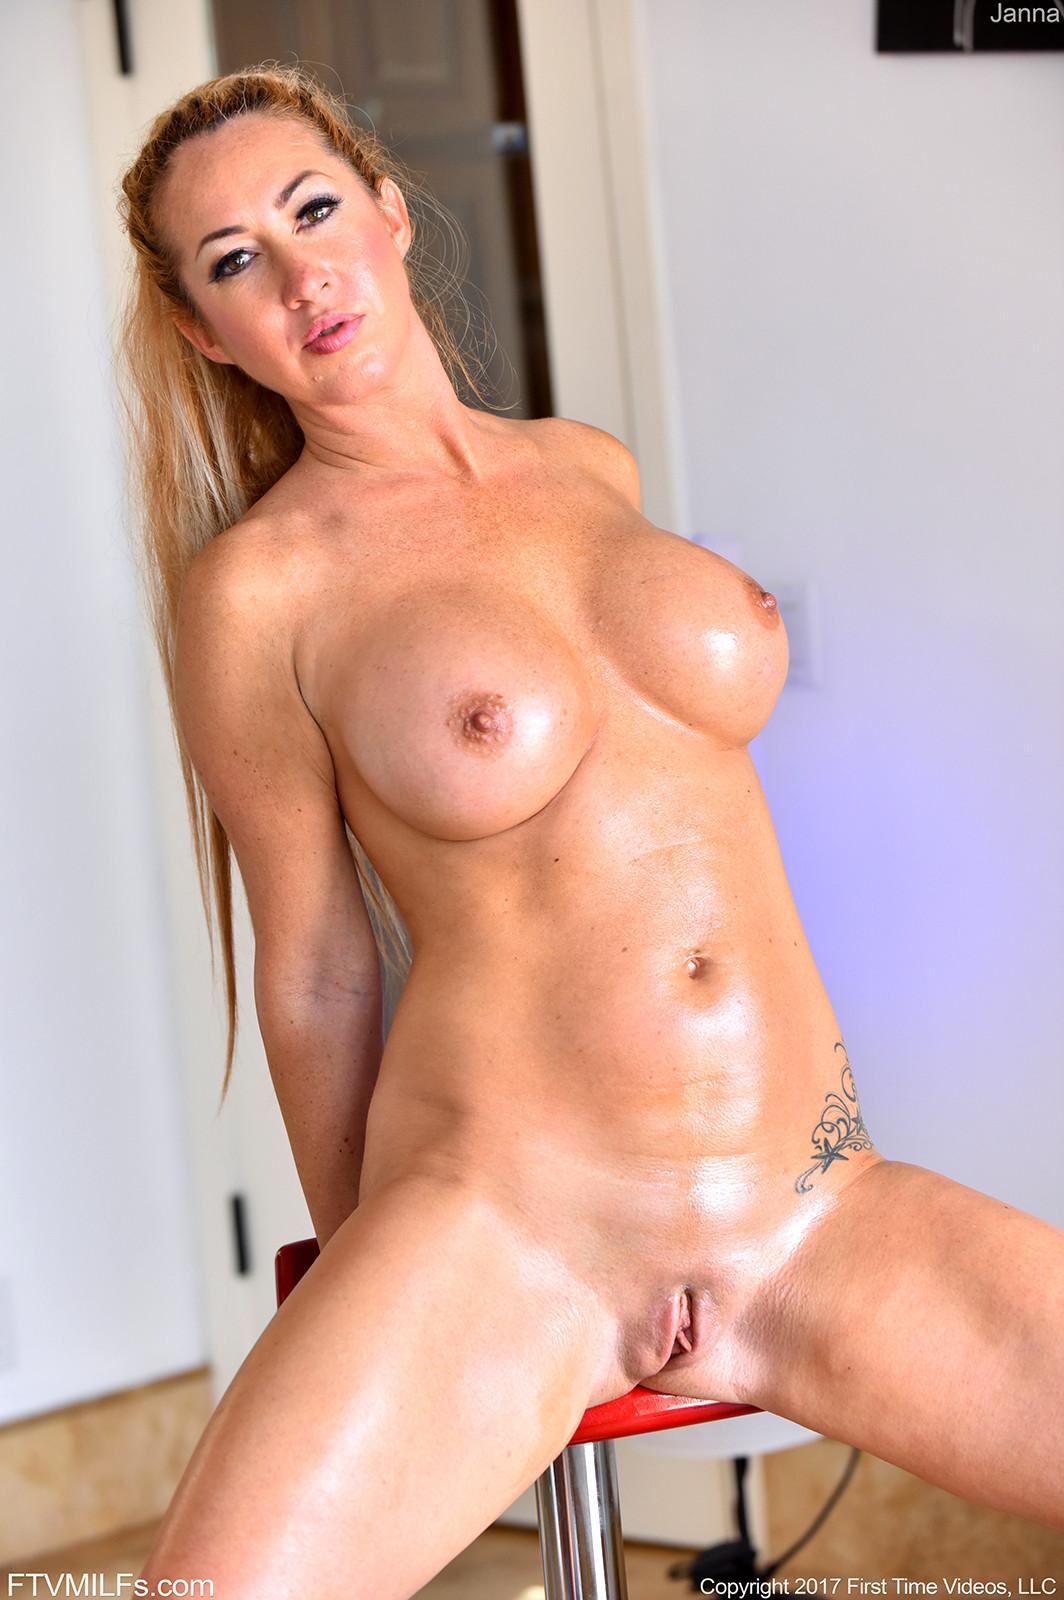 boob janna